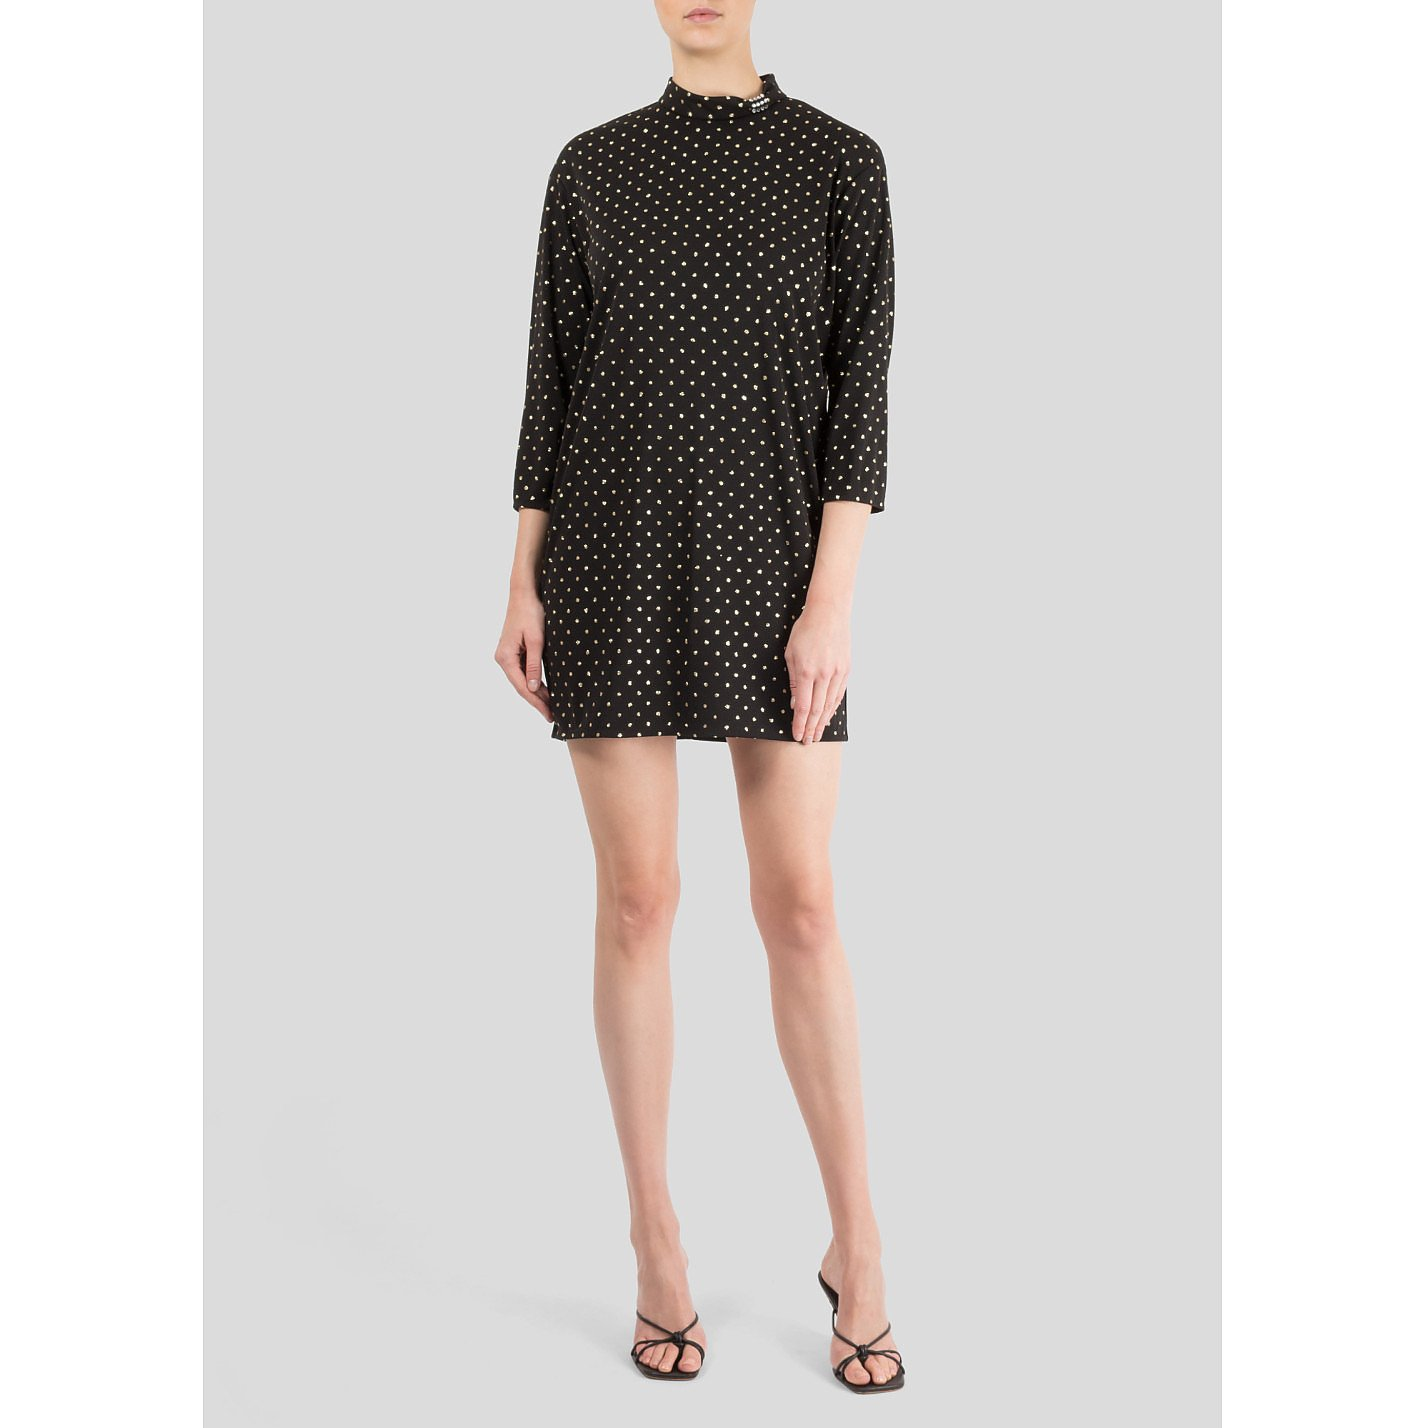 Marc Jacobs Polka Dot Mini Dress